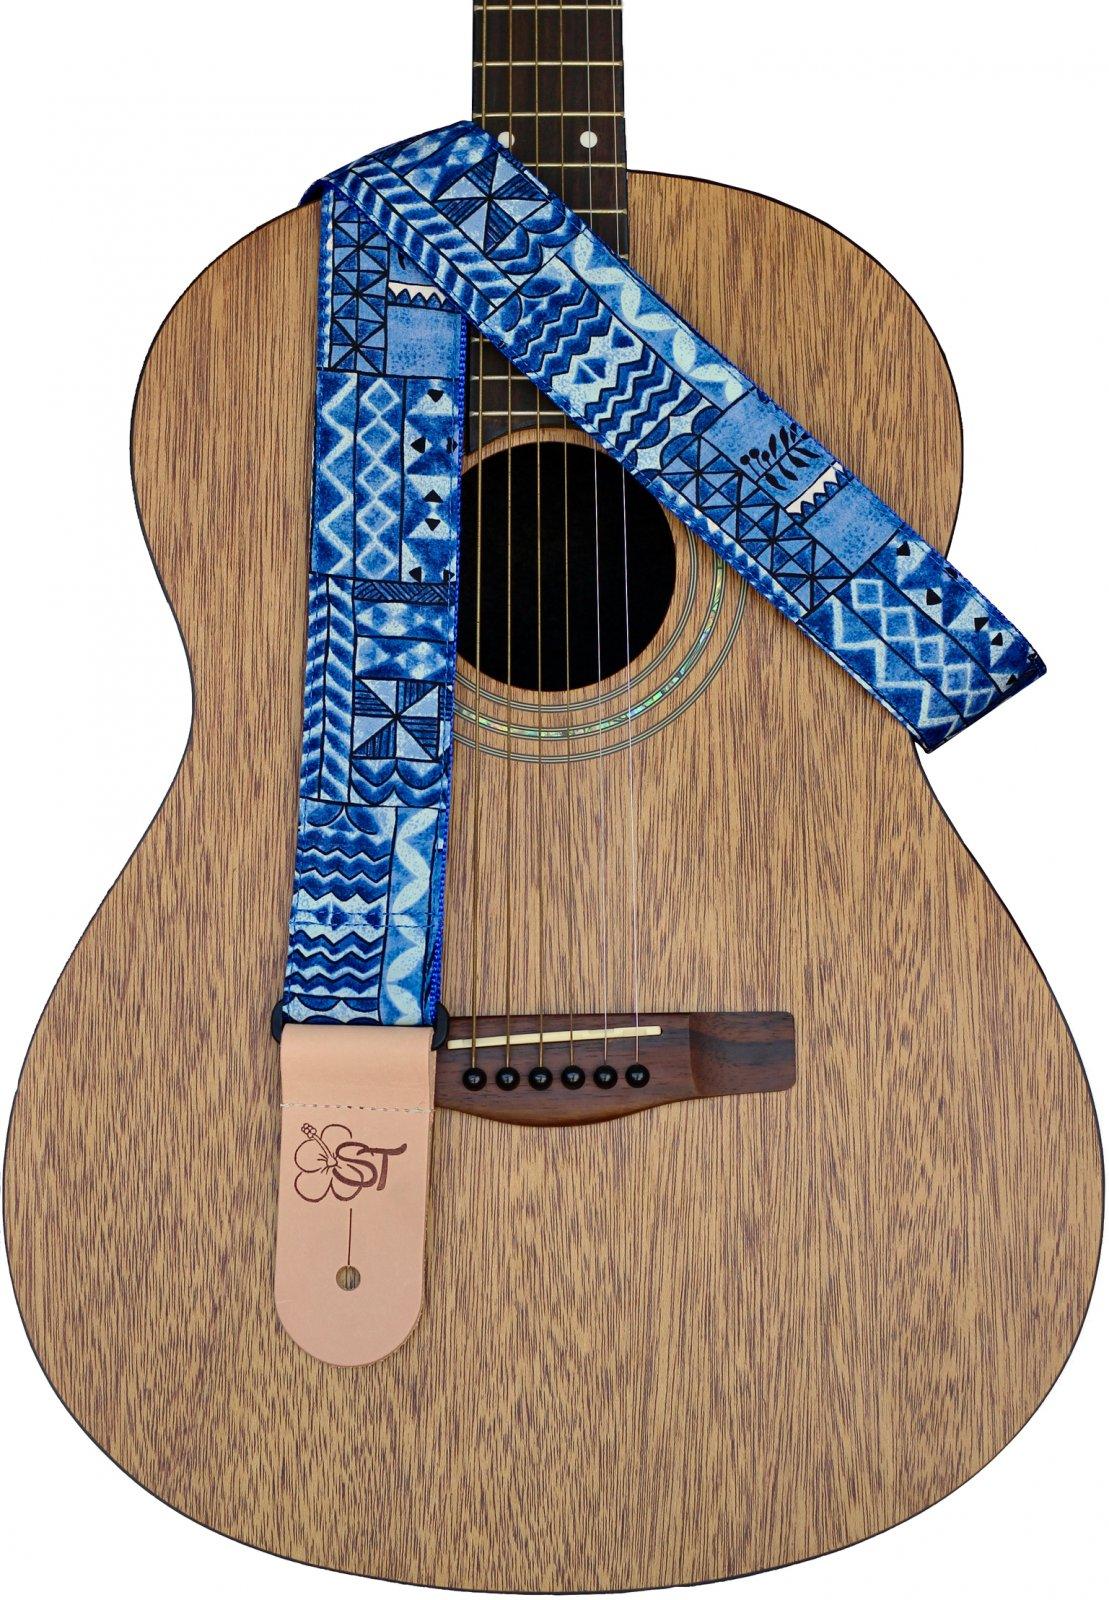 Sherrin's Threads 2 Hawaiian Print Guitar Strap - Ocean Tapa